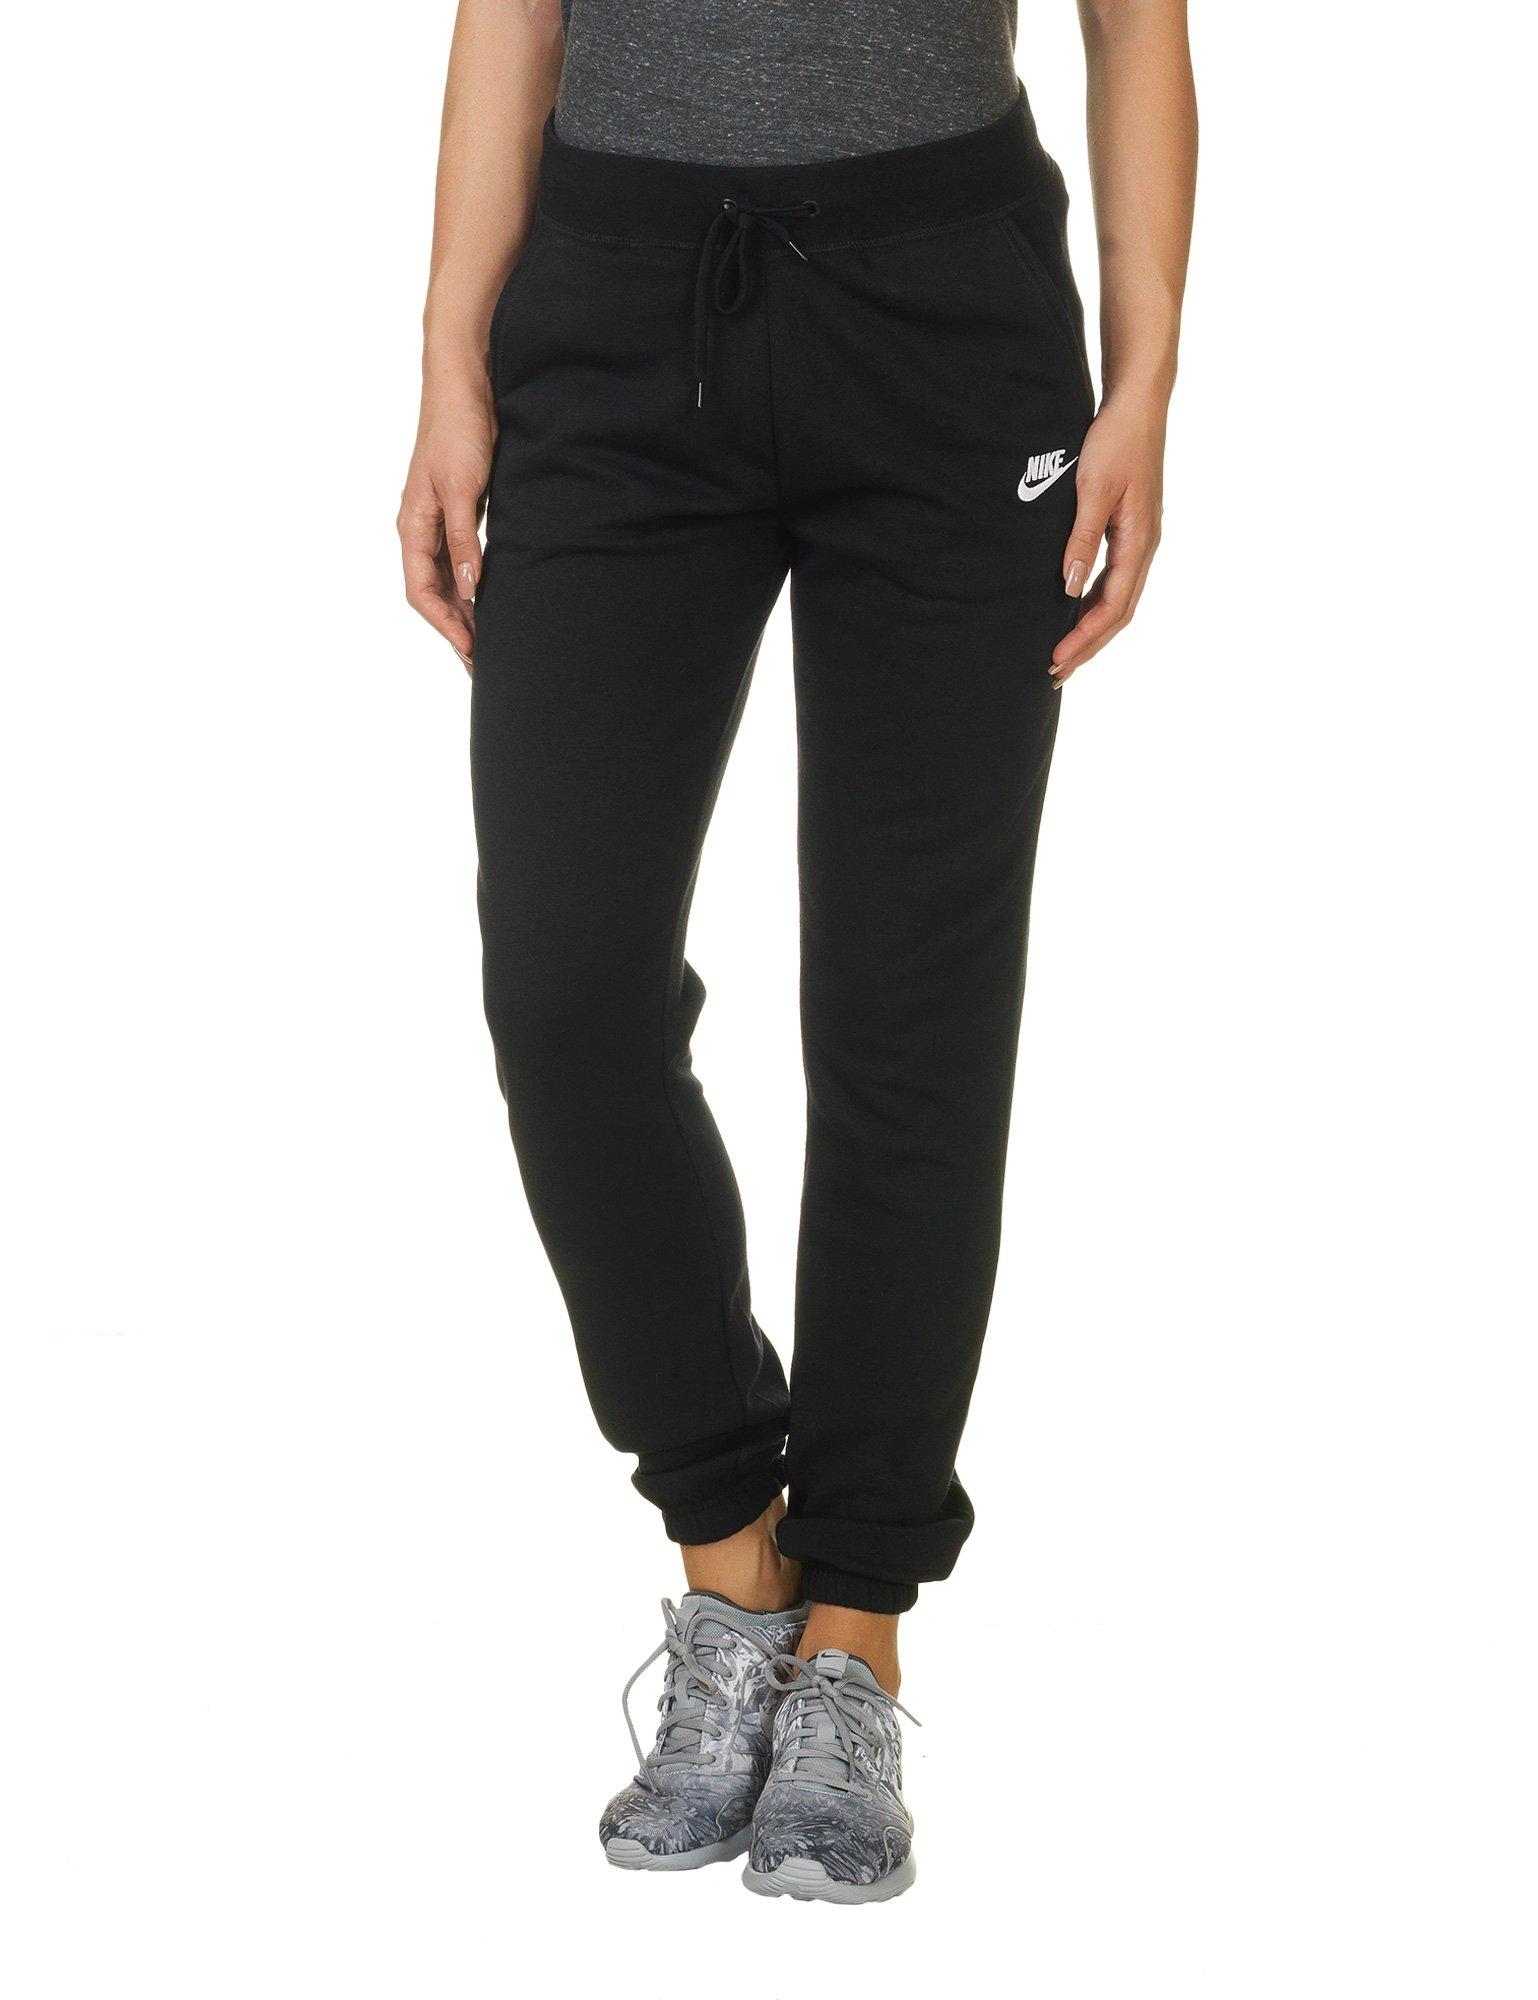 NIKE Women's Sportswear Regular Fleece Pants, Black/Black/White, Medium Tall